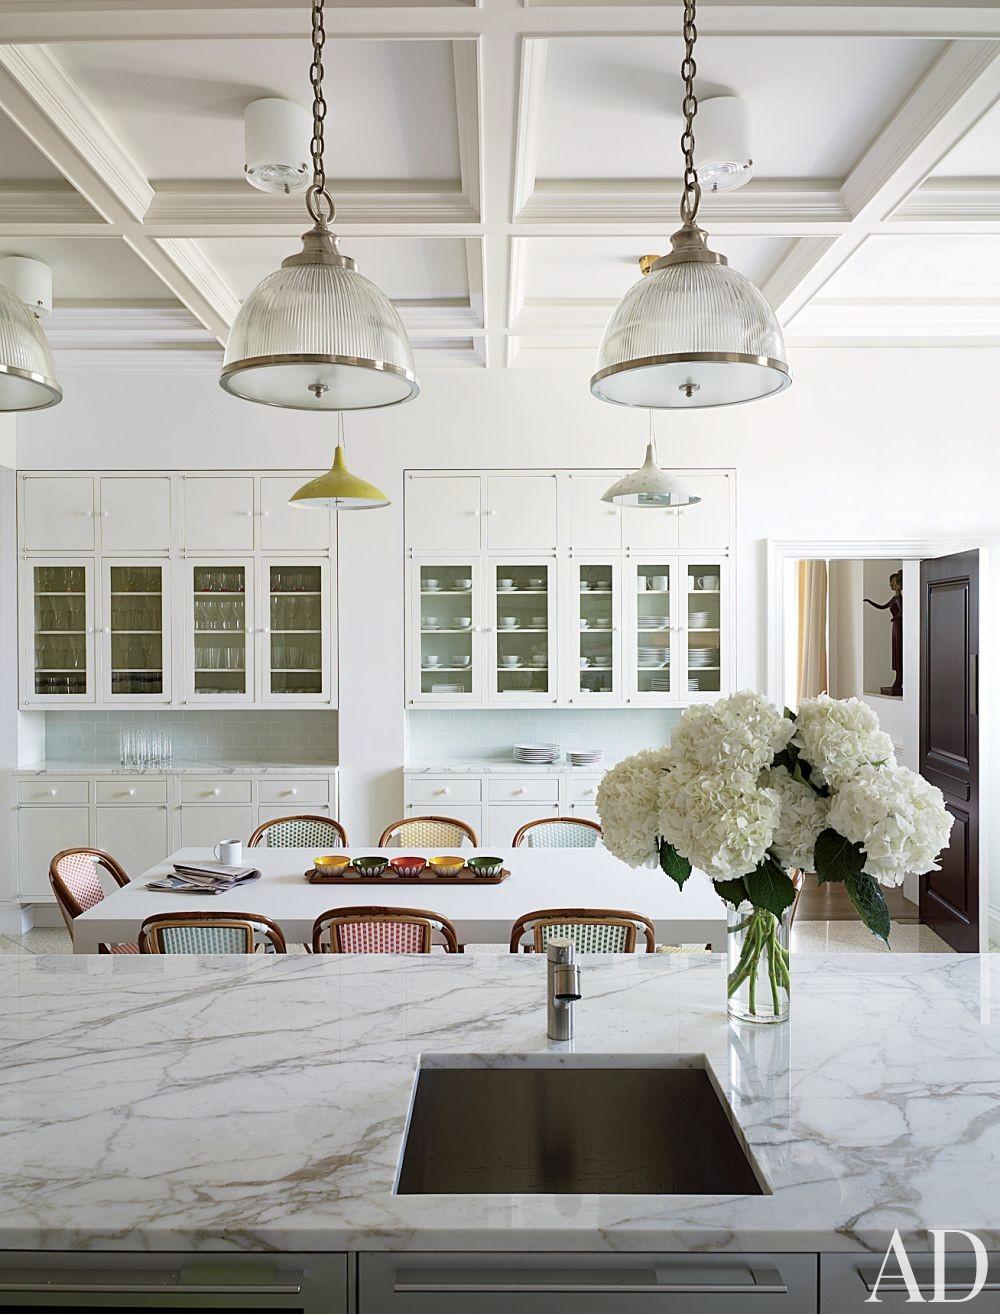 Traditional Kitchen by Shelton, Mindel & Associates in New York, New York